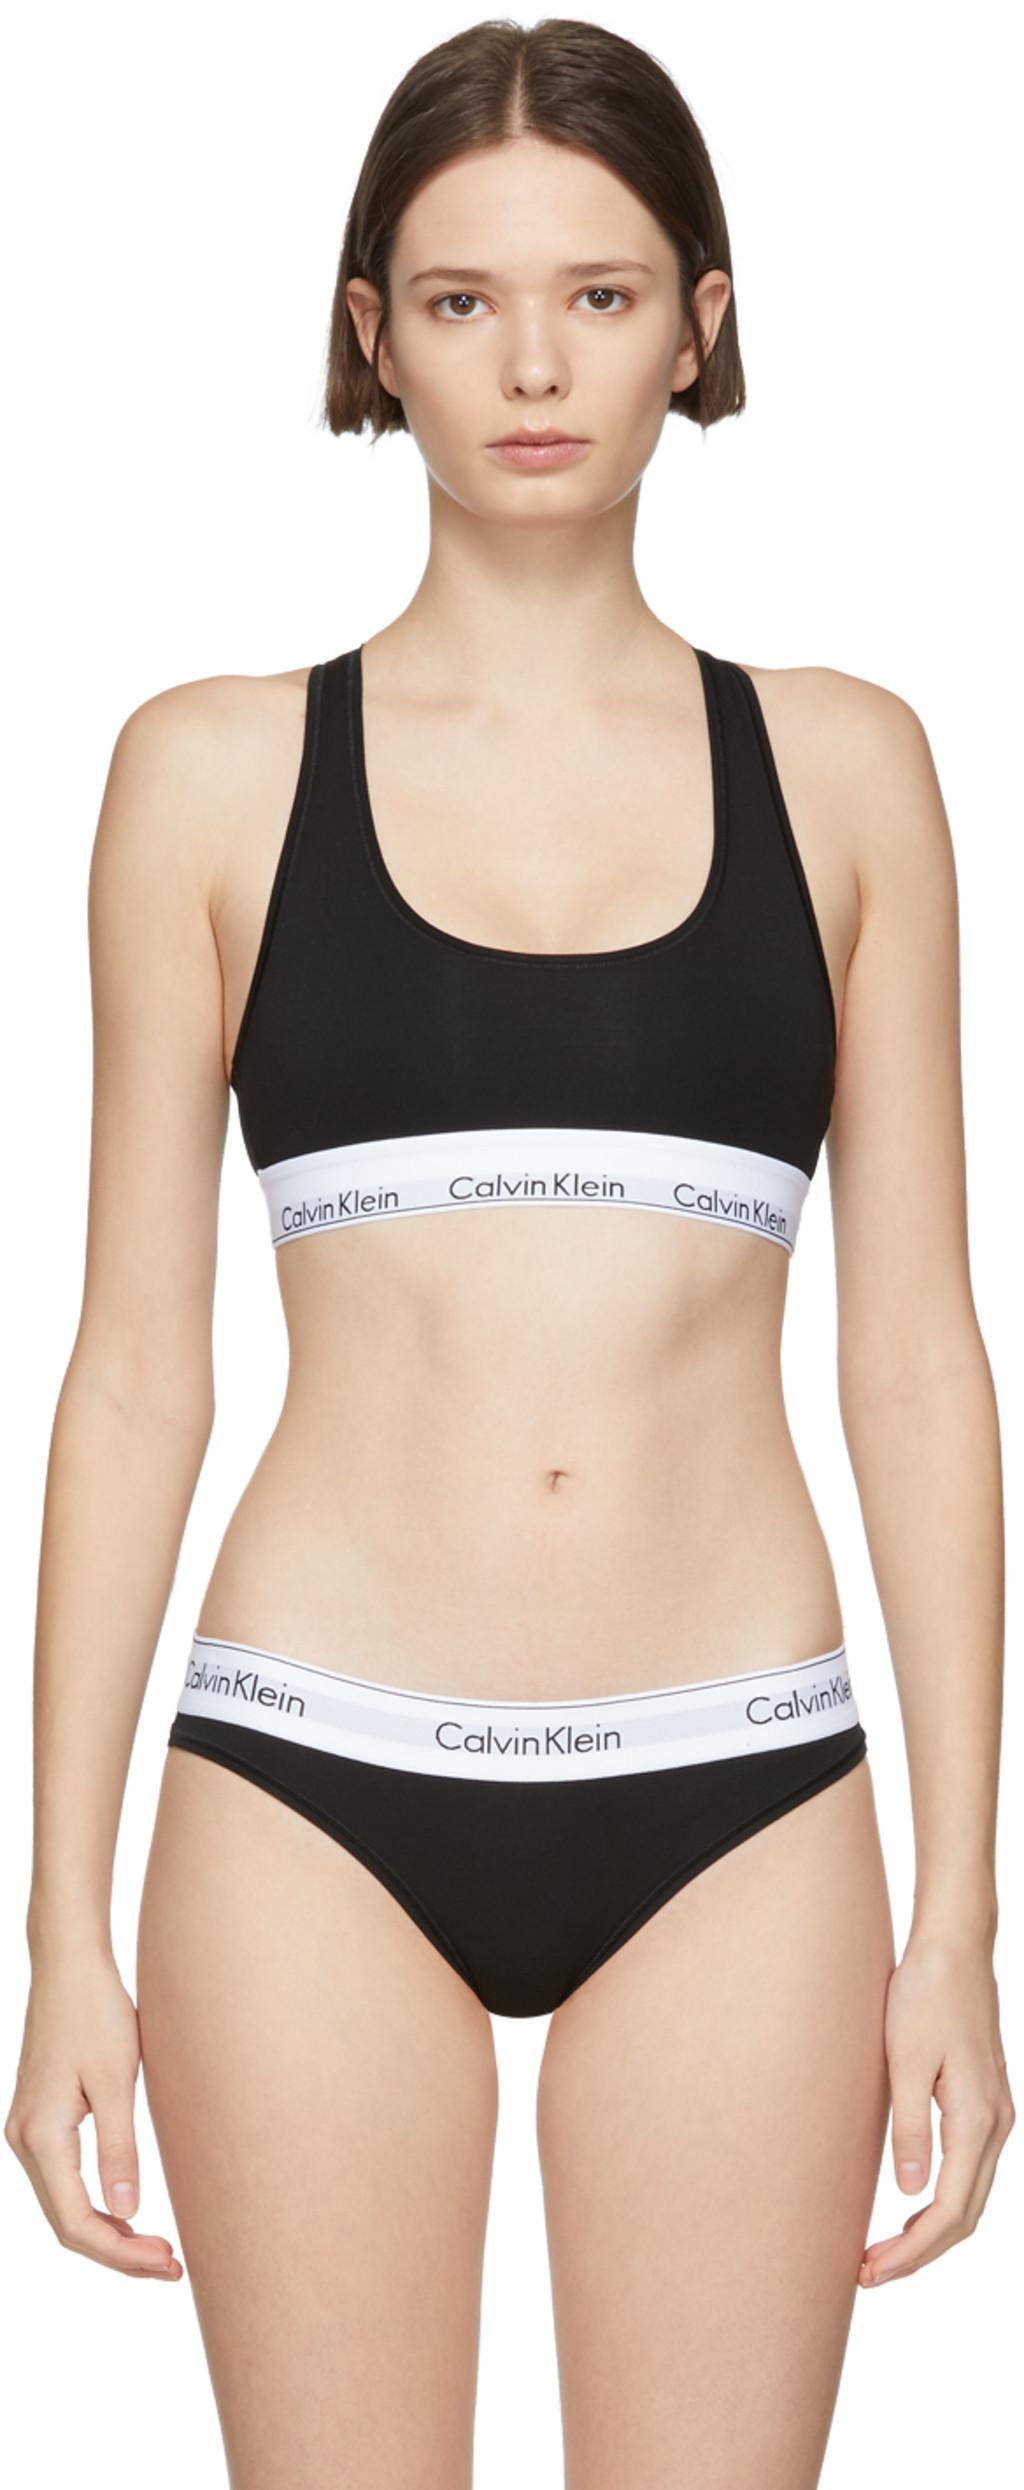 594ca770e2 Calvin Klein Underwear lingerie for Women